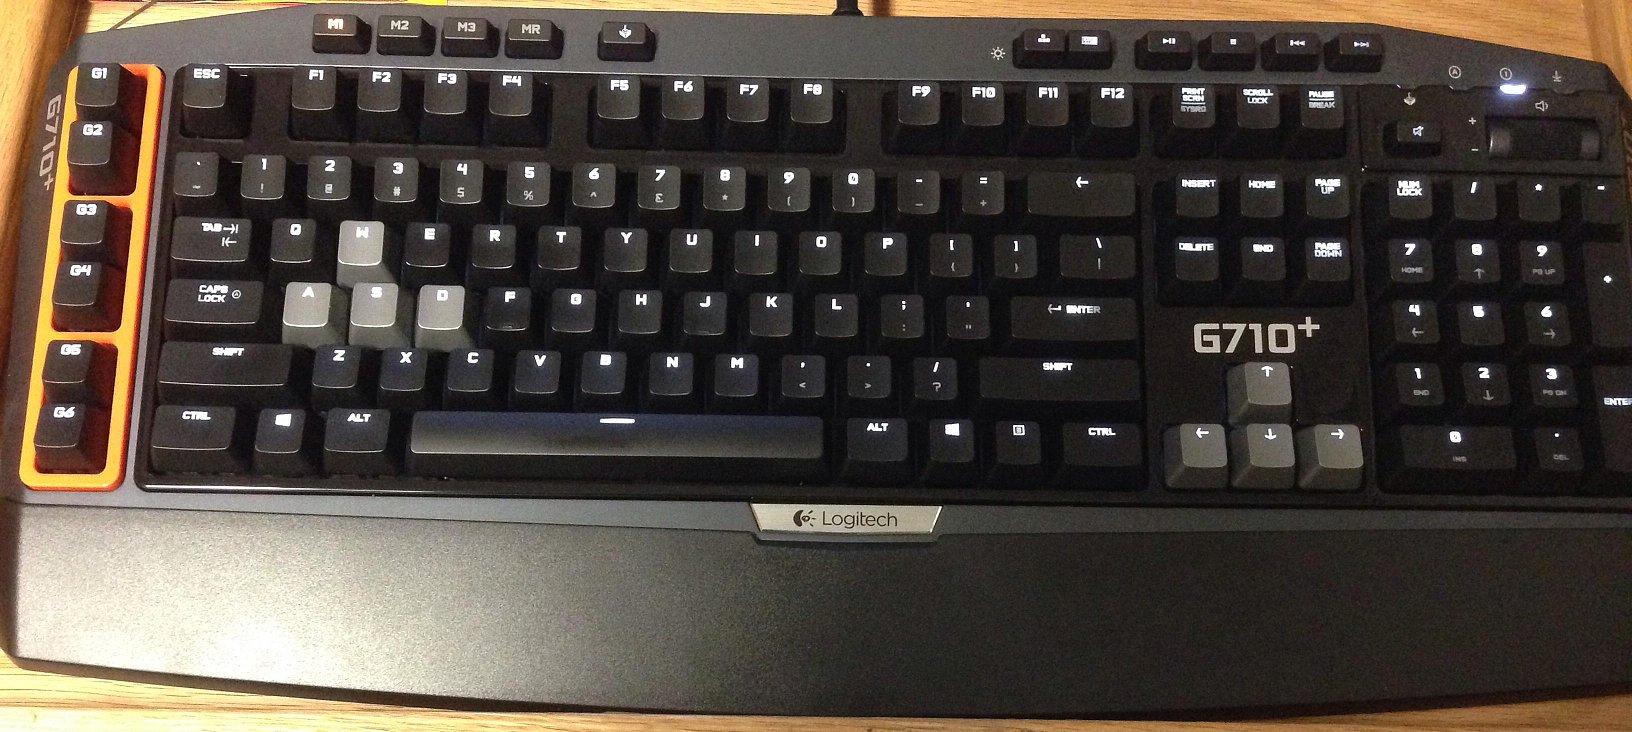 Logitech G710+ Mechanical Keyboard